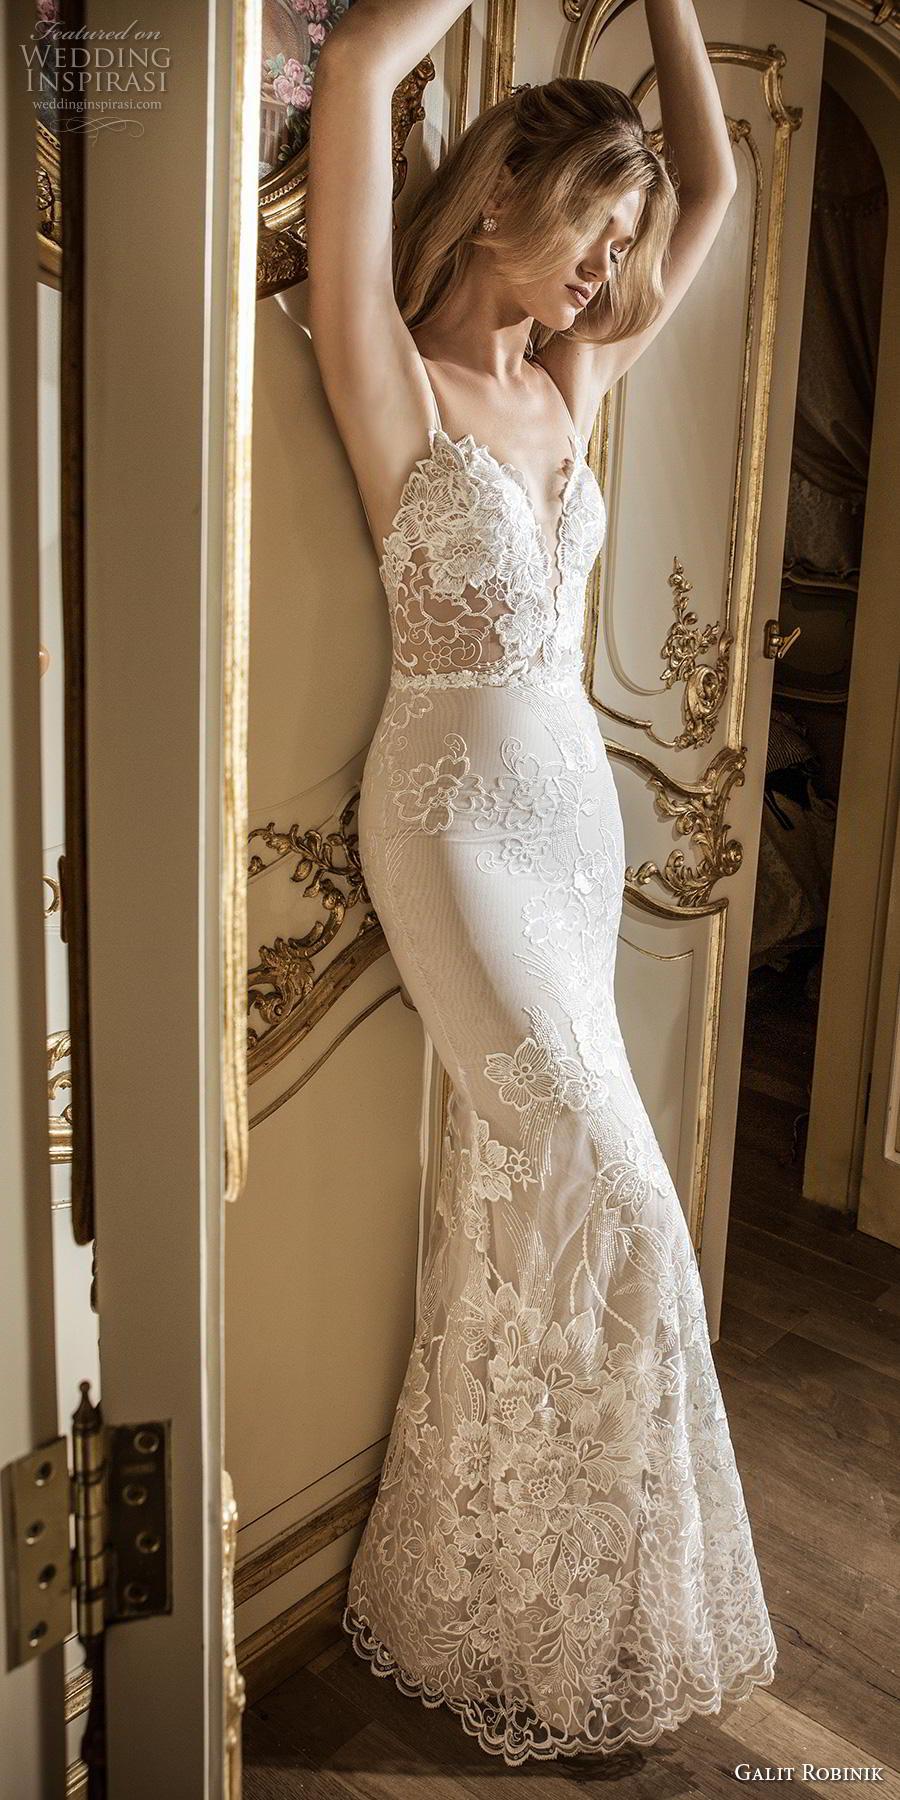 galit robinik 2019 bridal thin strap deep sweetheart neckline full embellishment elegant romantic fit and flare wedding dress backless chapel train (2) mv